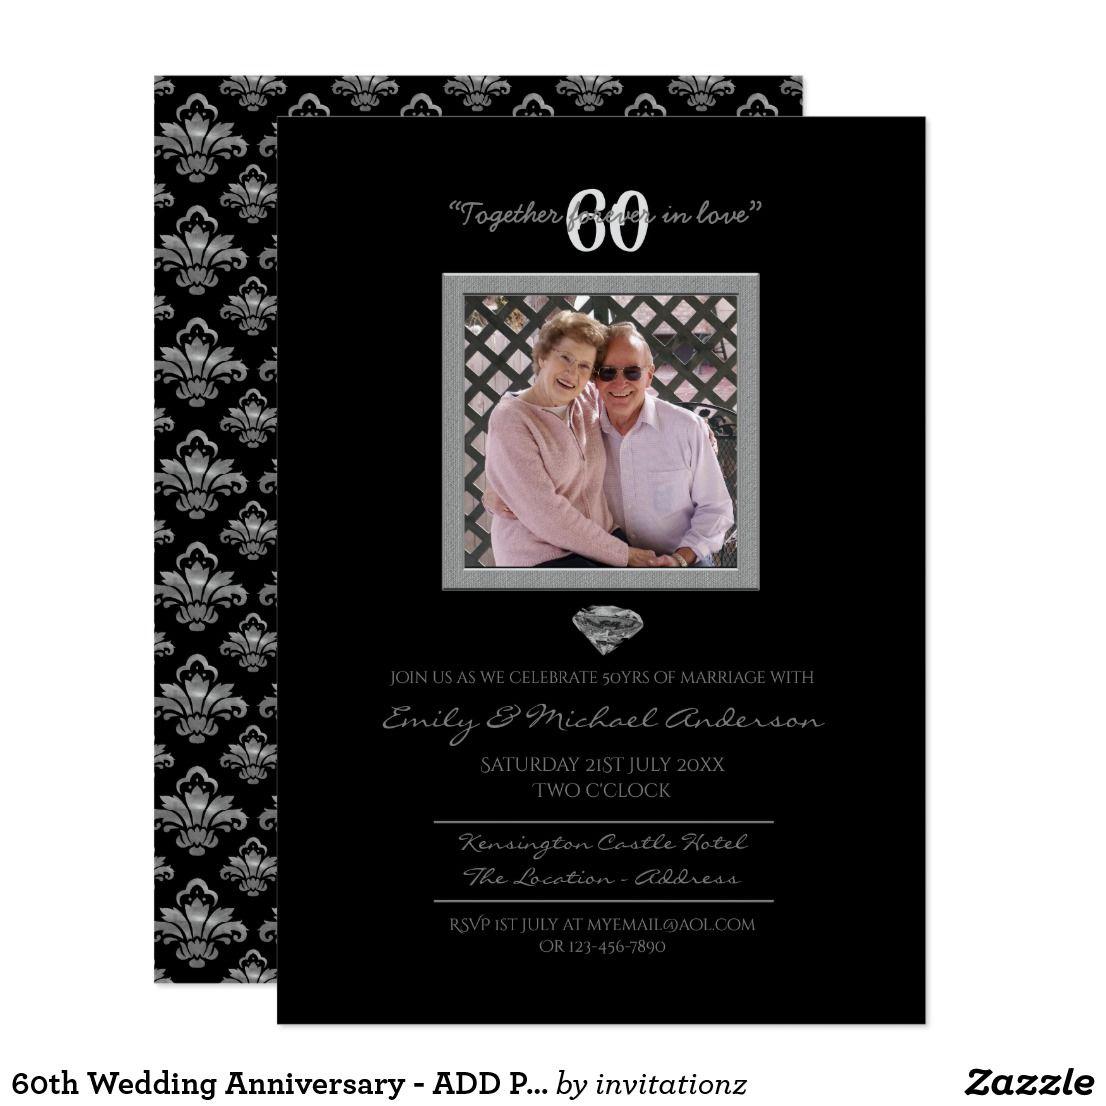 60th Wedding Anniversary Add Photo Invitations Gift Ideas